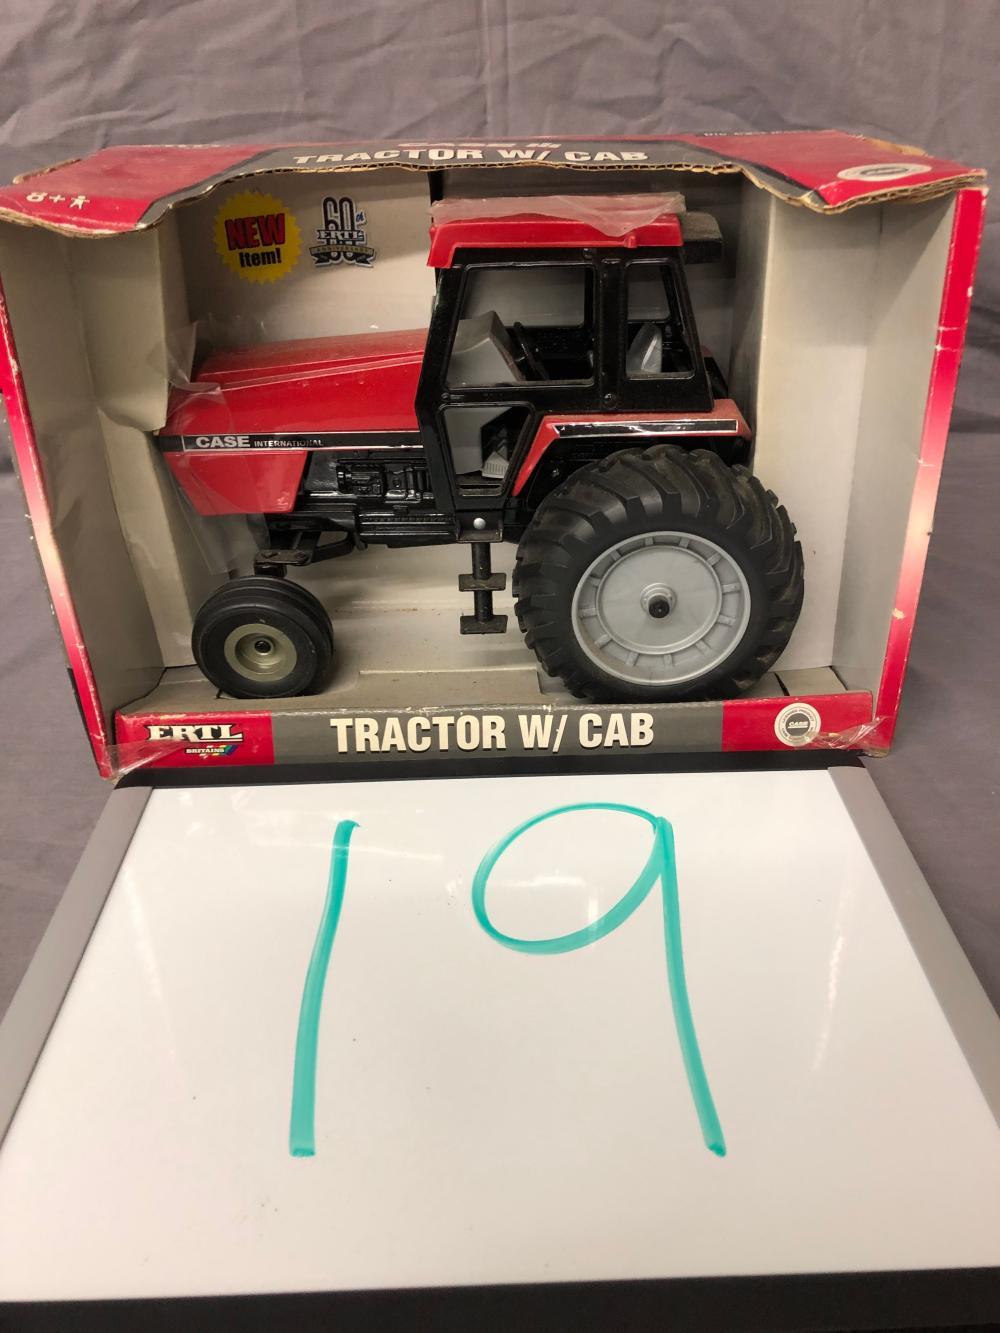 1/16th Scale Case IH Tractor w/ Cab